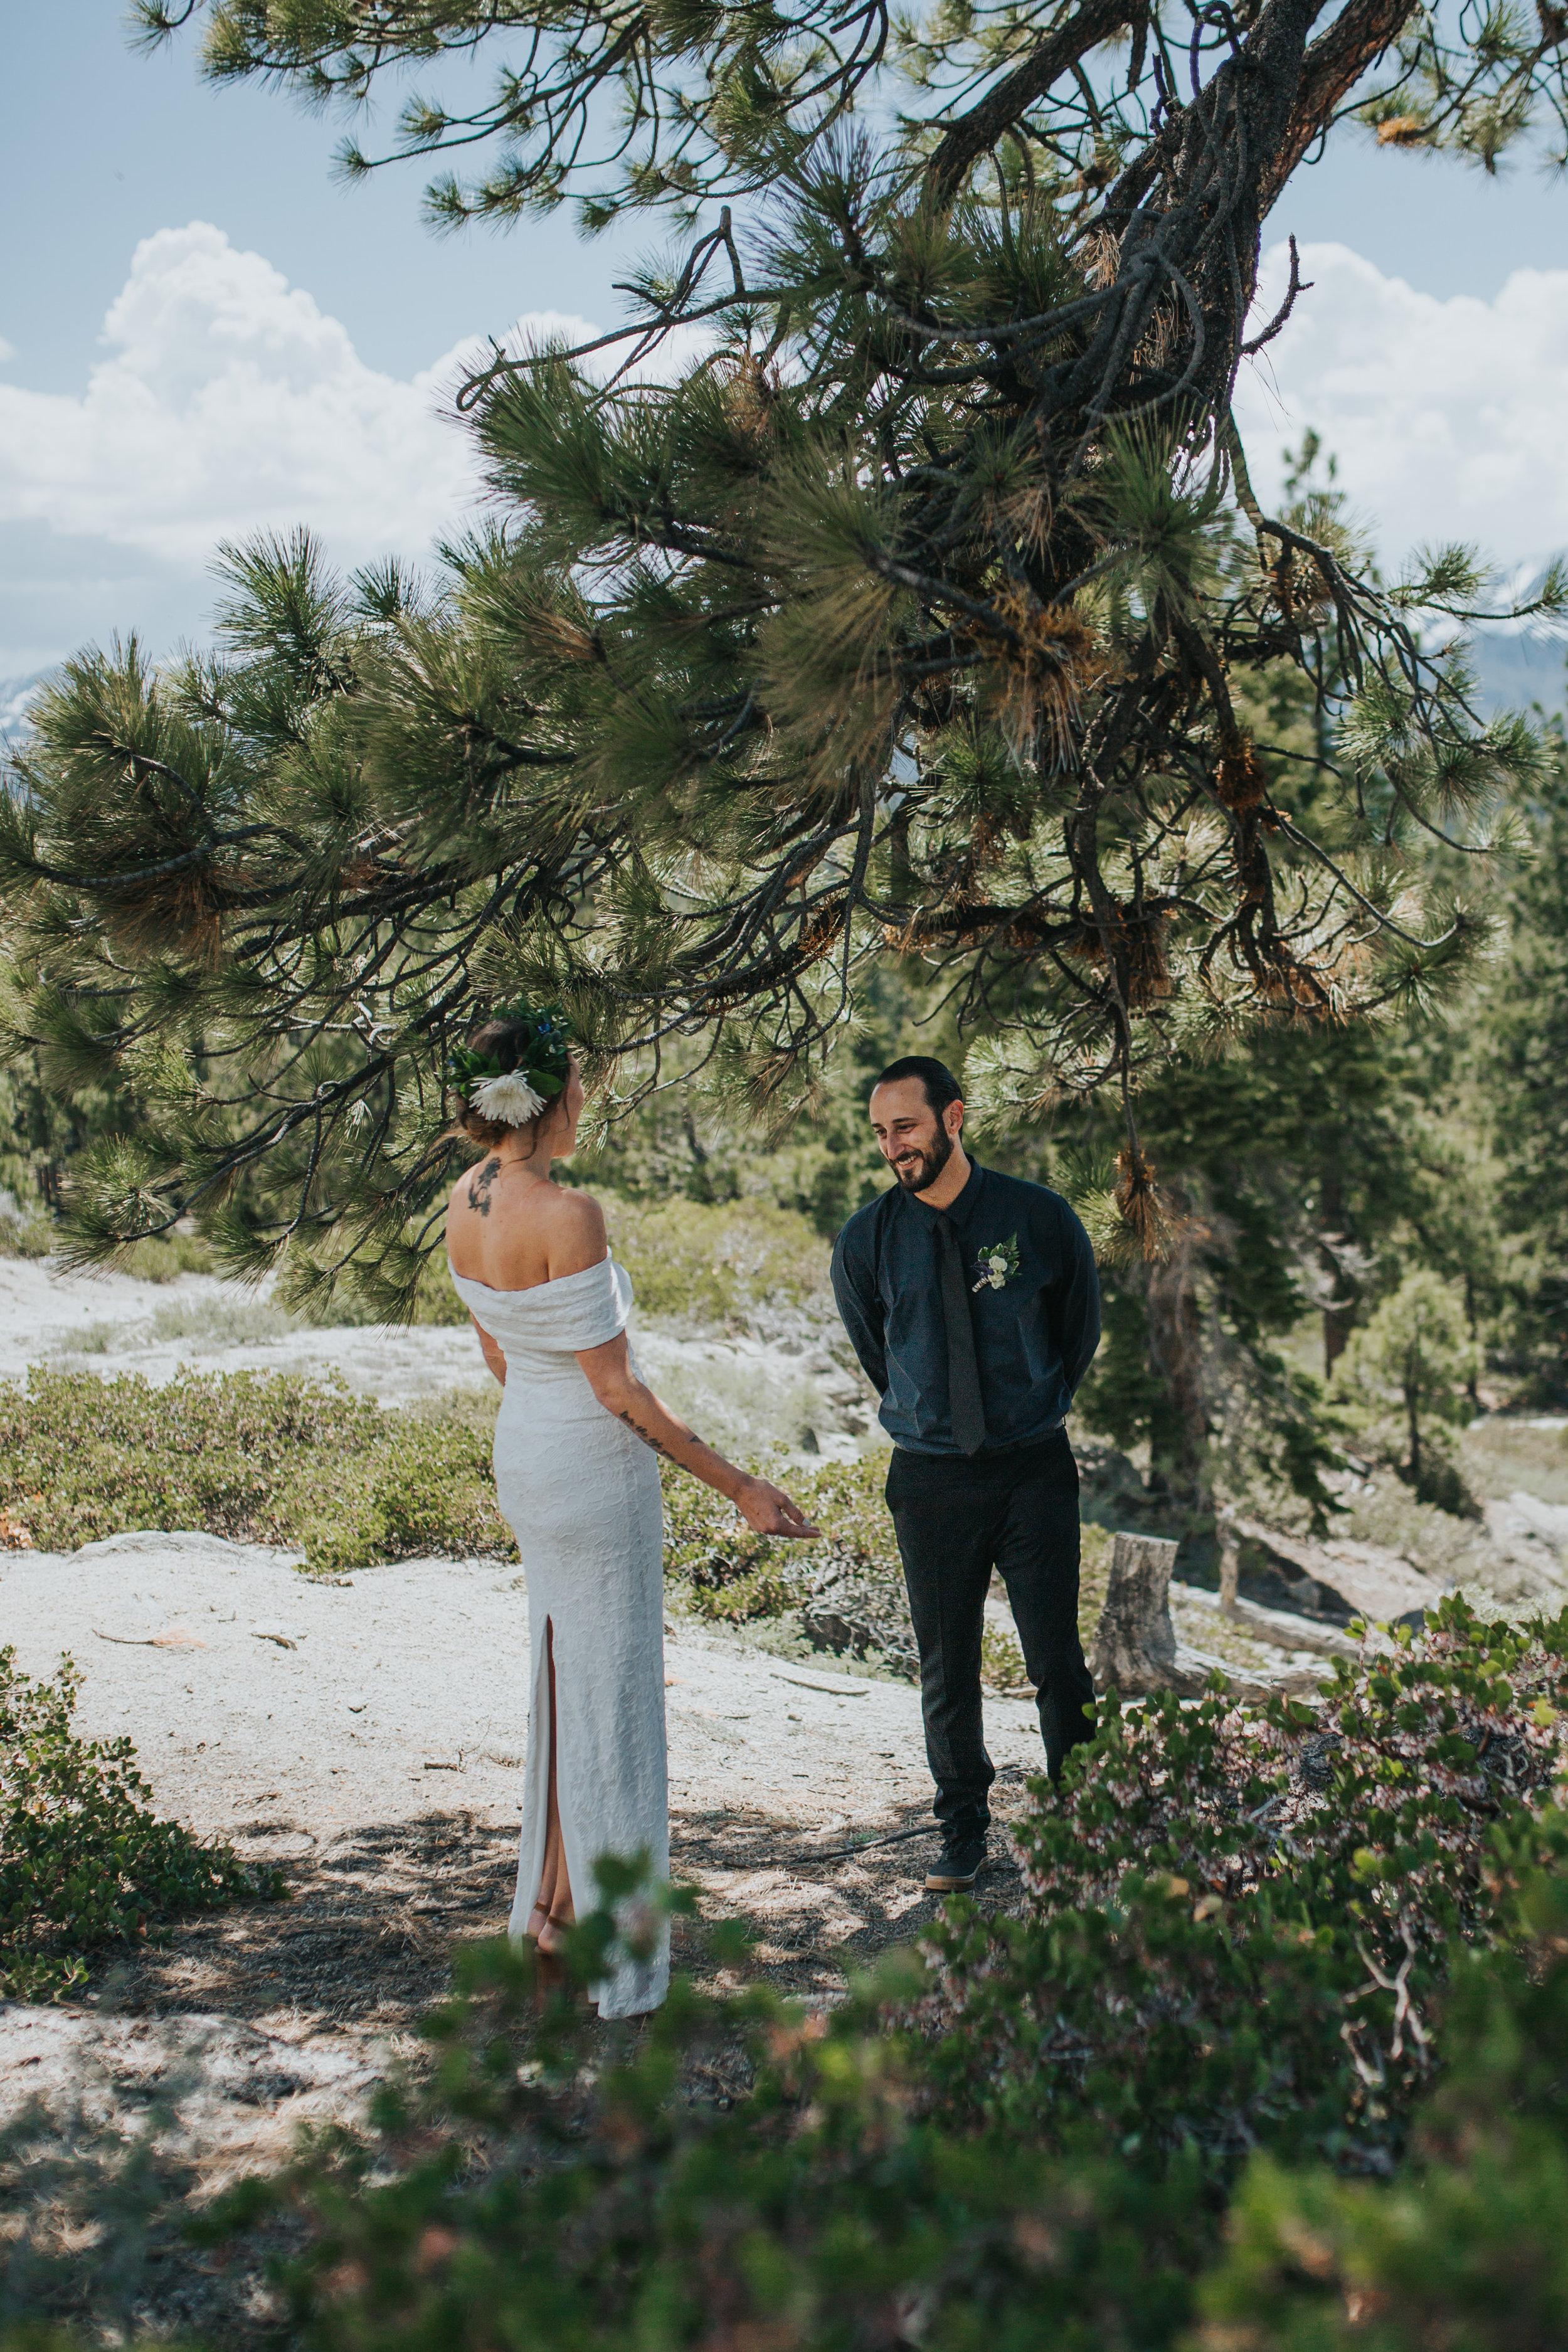 south-lake-tahoe-elopement-valerie-lendvay-photo-008.jpg